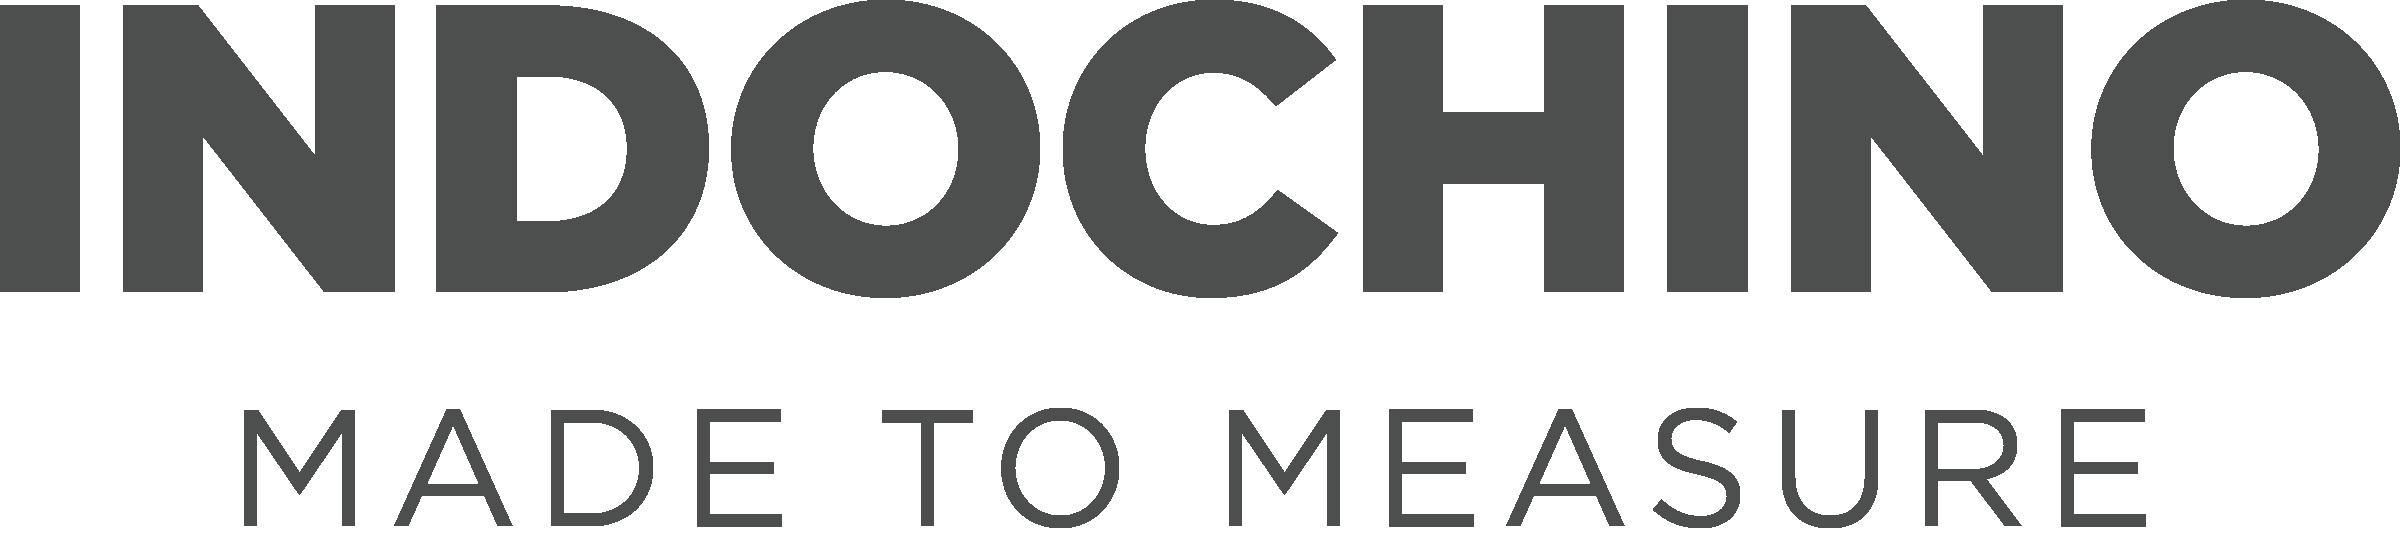 indochino_logo_made-to-measure